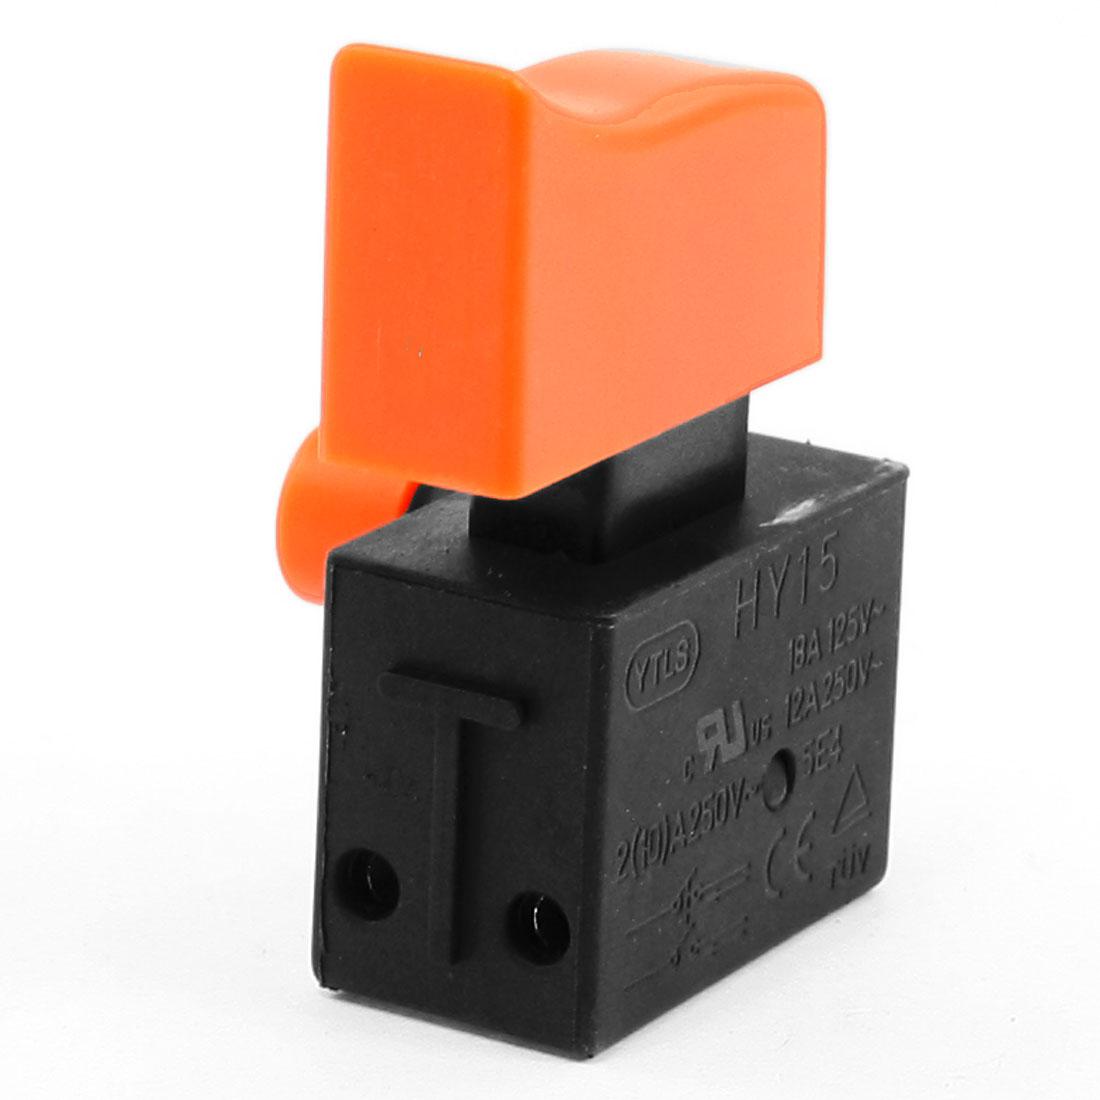 18A 125VAC 12A/2A/10A 250VAC 2NO DPST Self Locking Trigger Switch